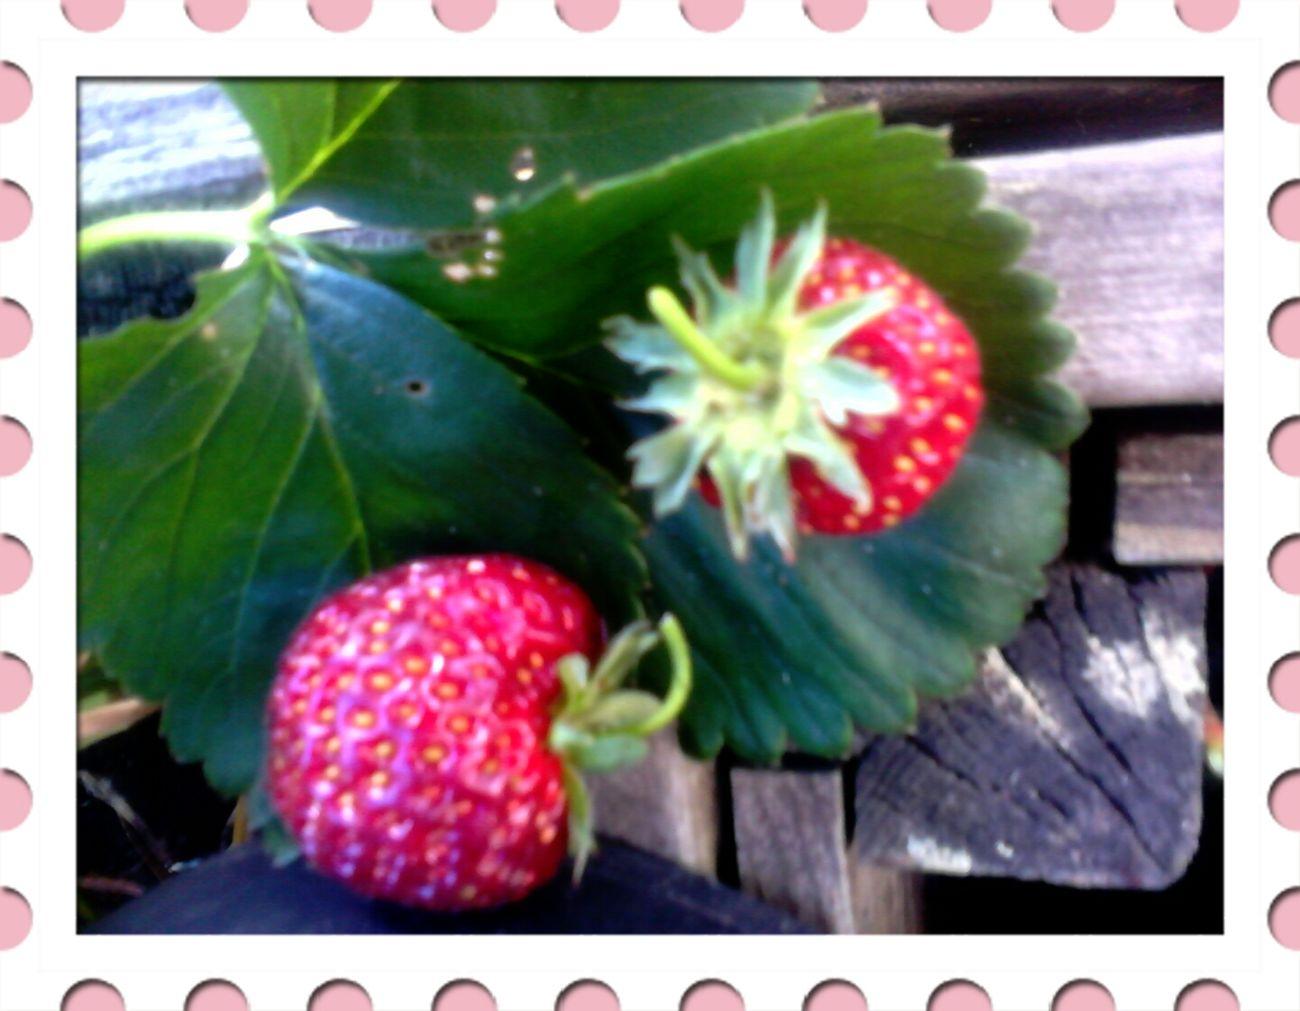 Strawberries rescued from my backyard B-) Strawberries Summer Food EyeEm Best Shots EyeEm Nature Lover